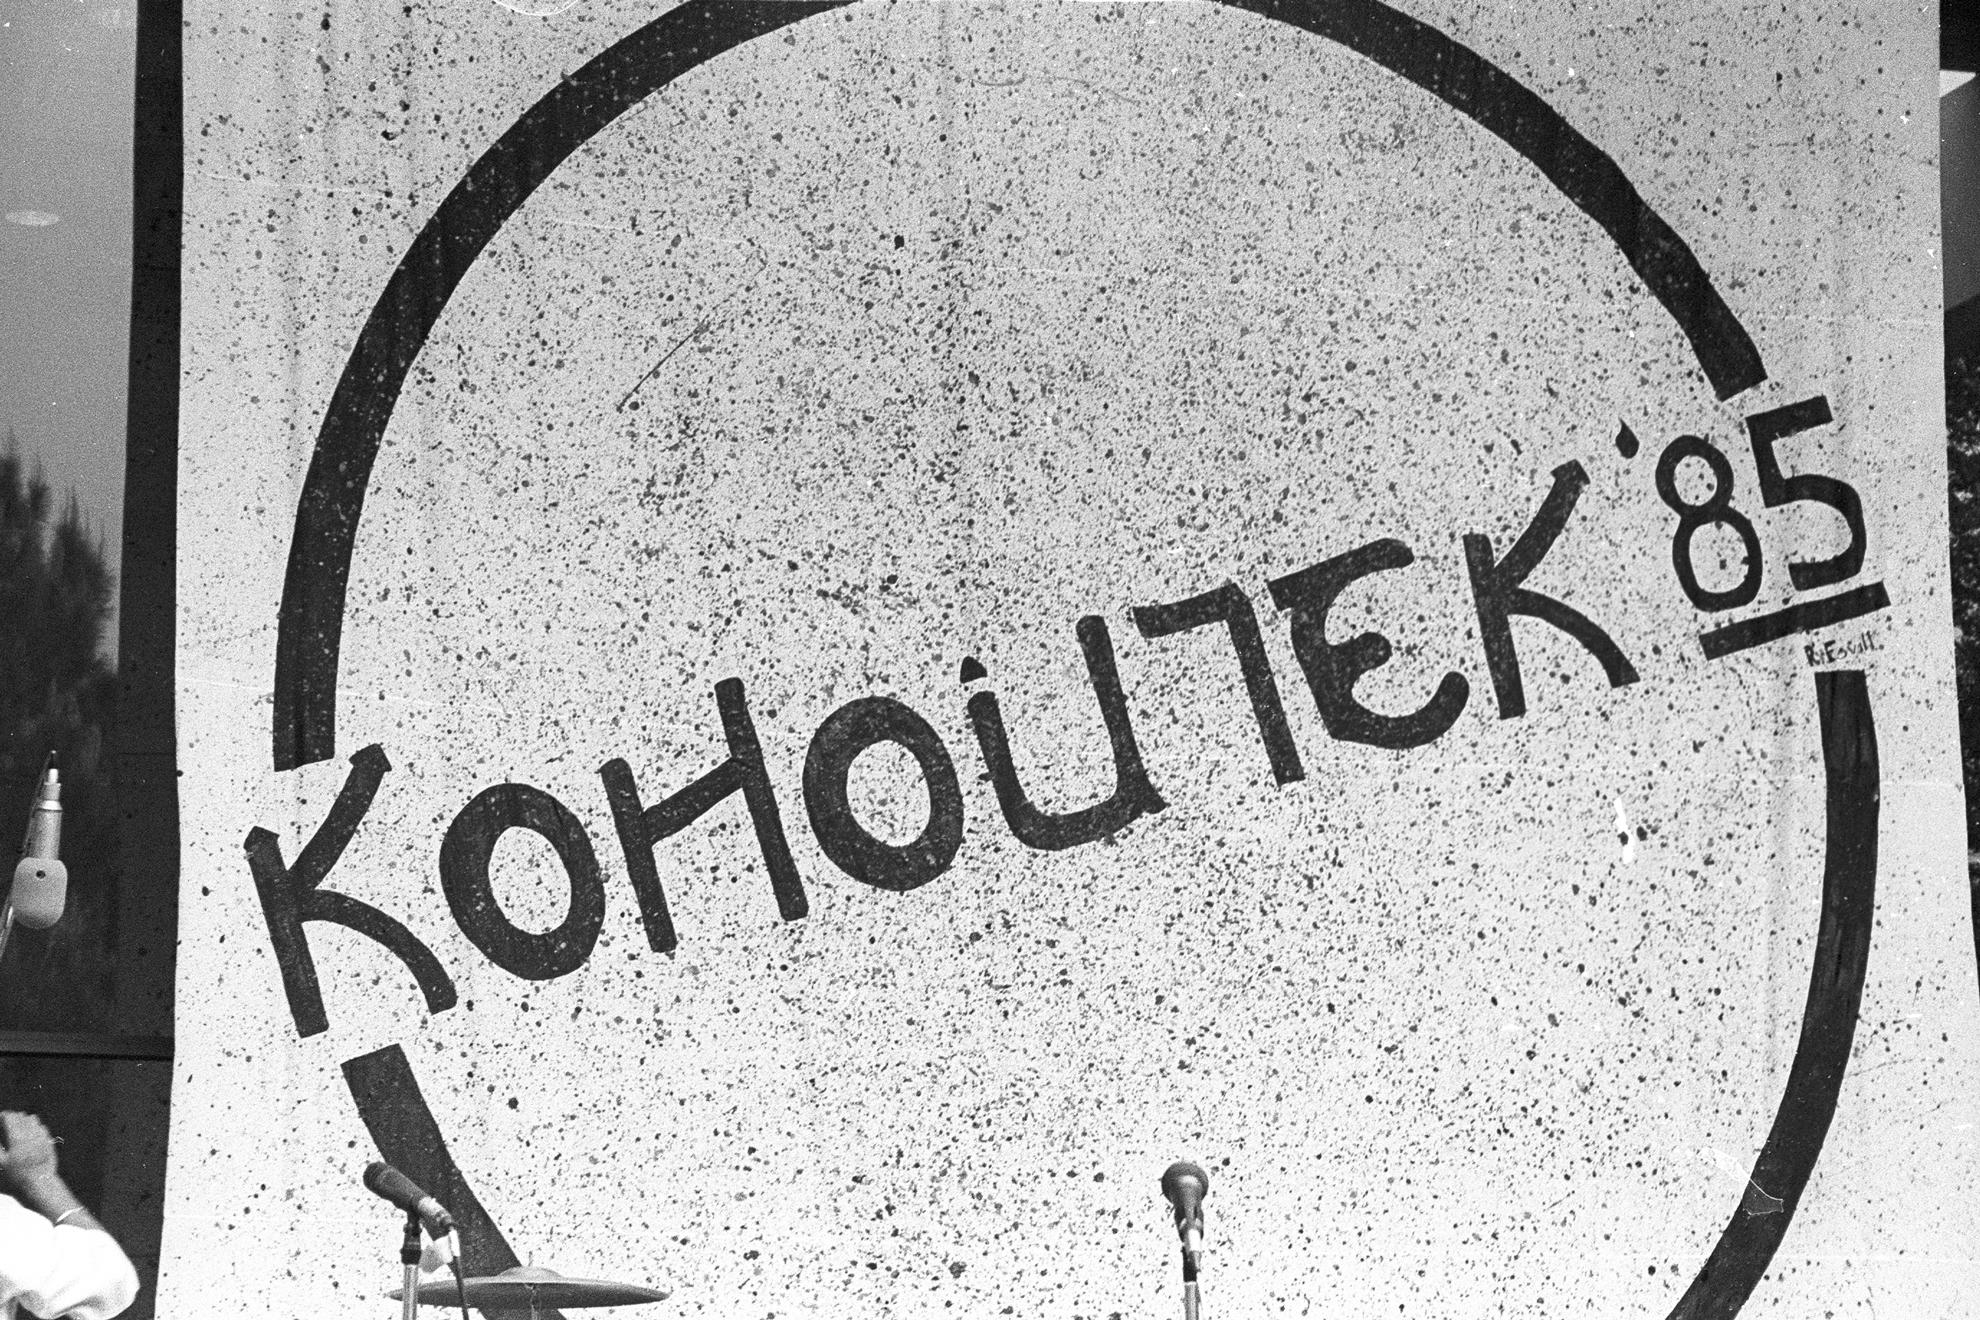 1985 - Kohoutek sign